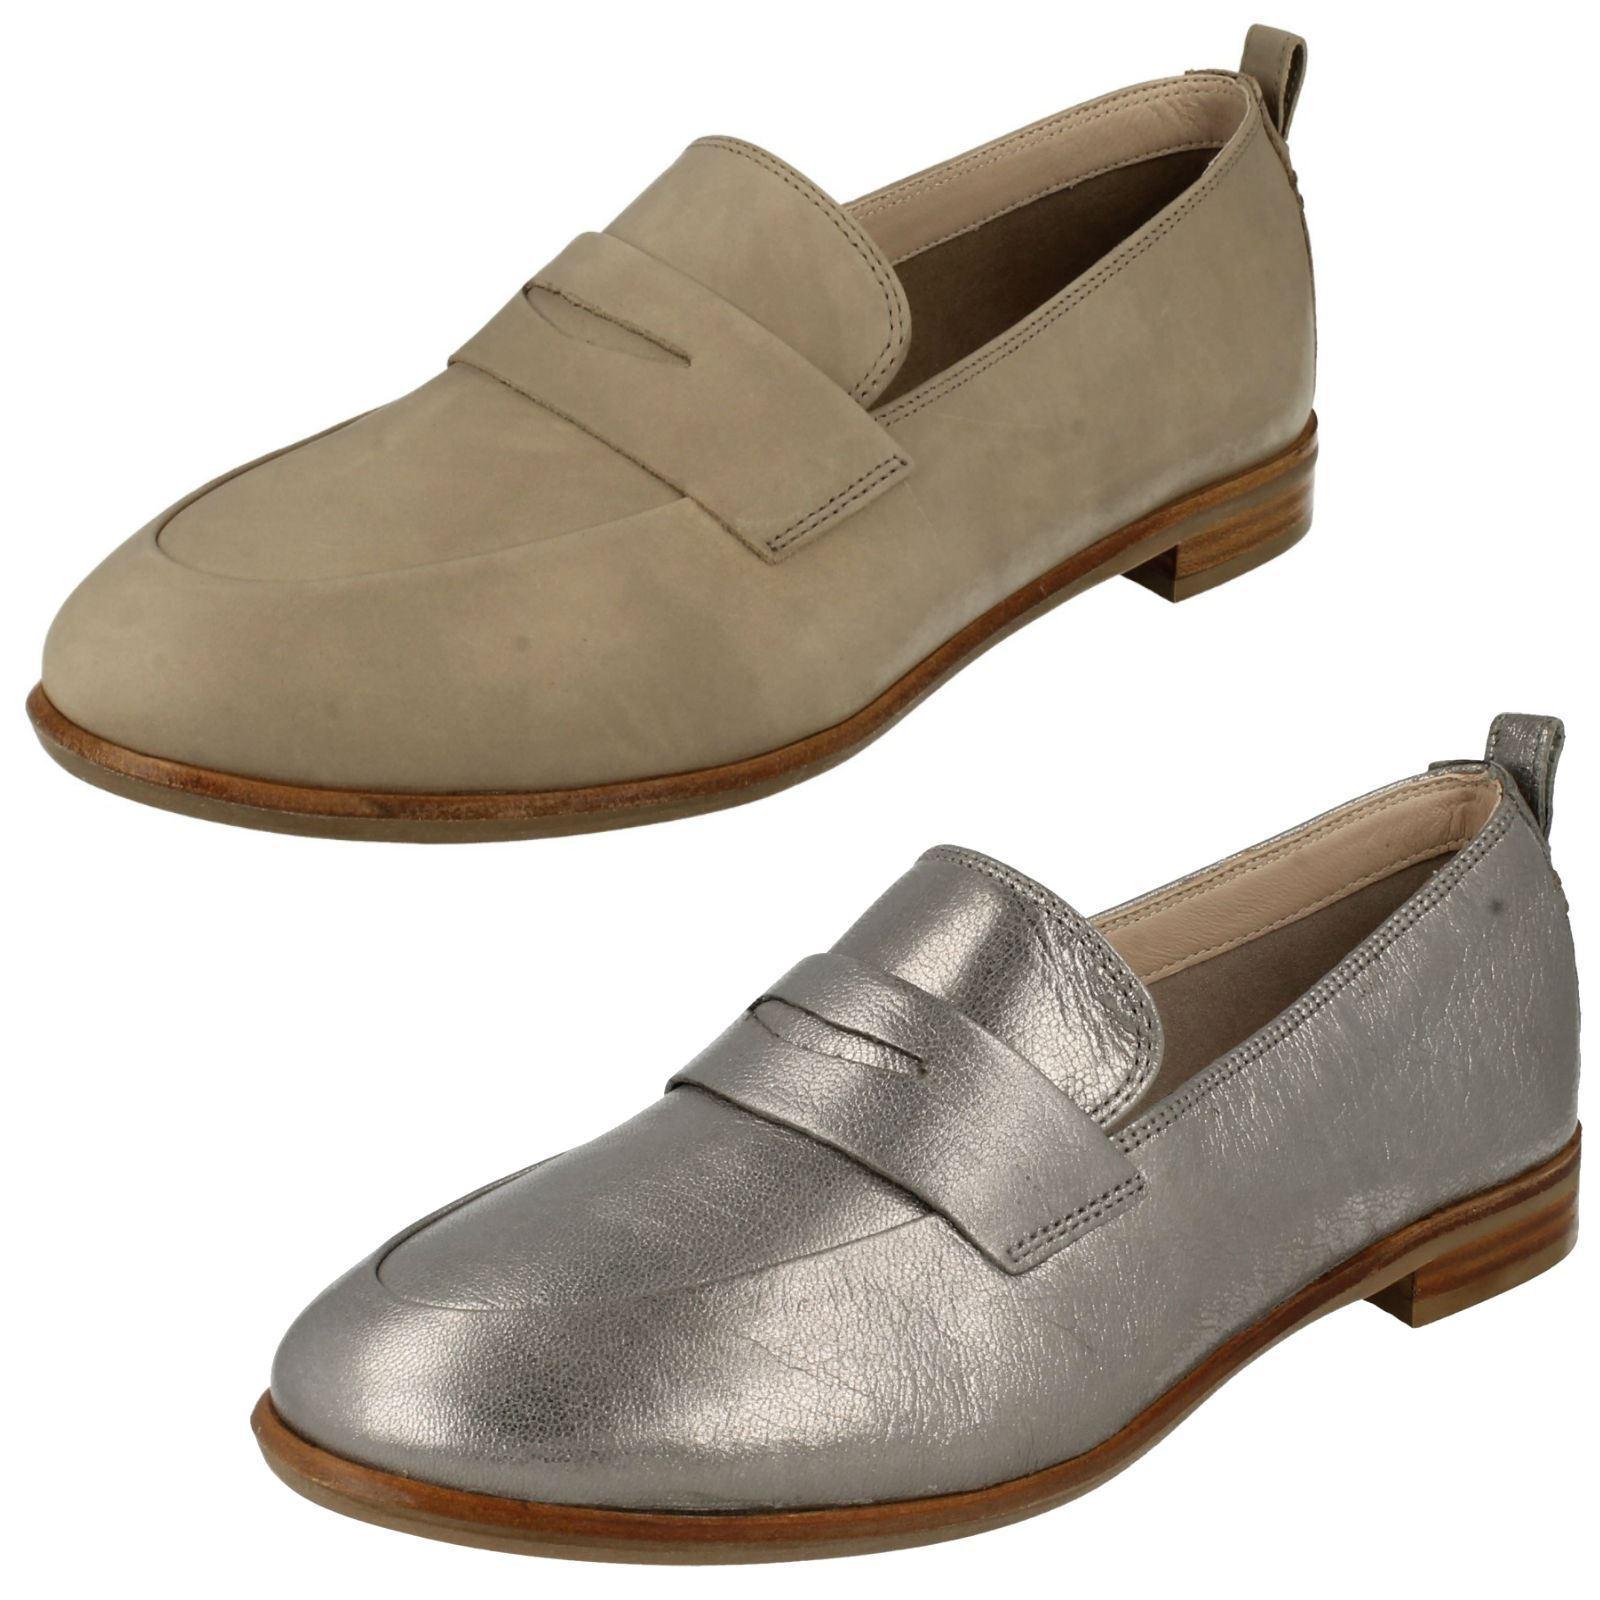 Ladies Clarks Slip On Loafers Alania Belle